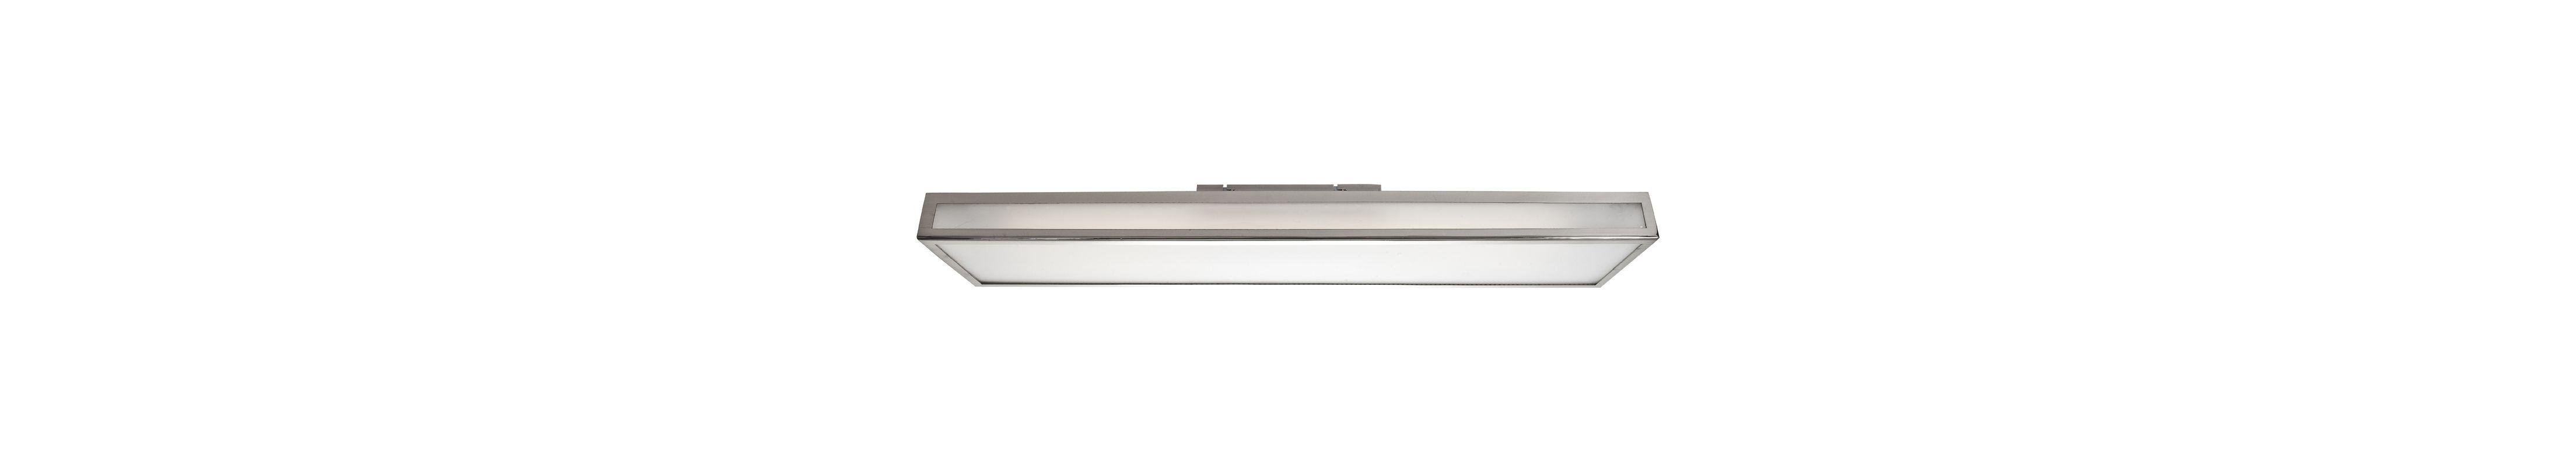 Access Lighting 31026 Ark 2 Light Flush Mount Ceiling Fixture Brushed